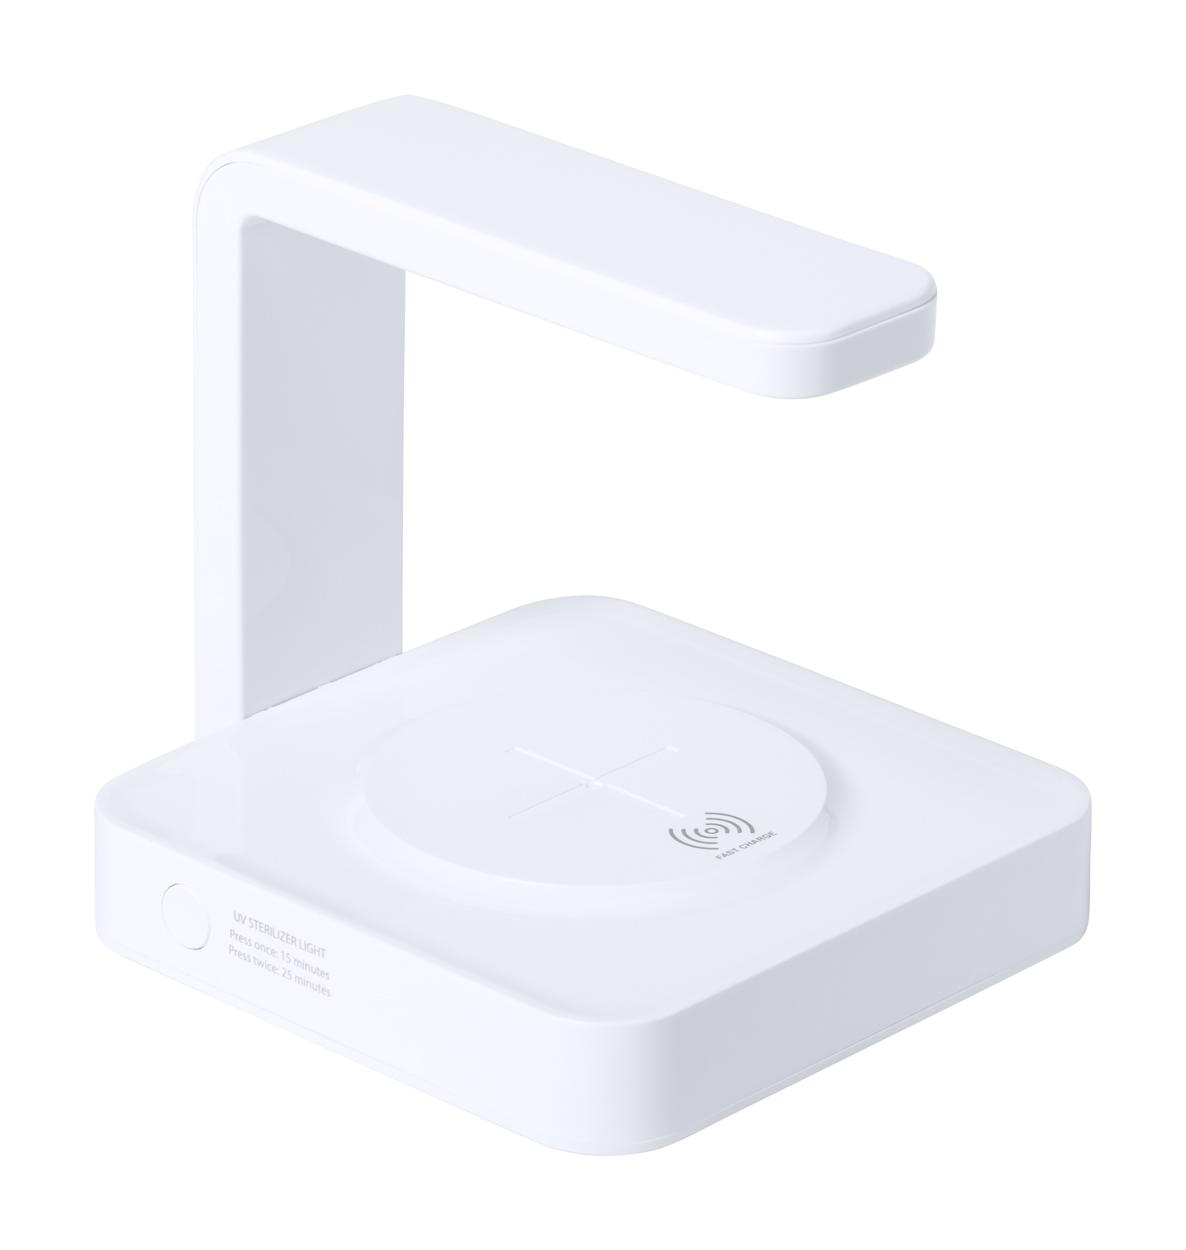 Blay UV sterilizer wireless charger